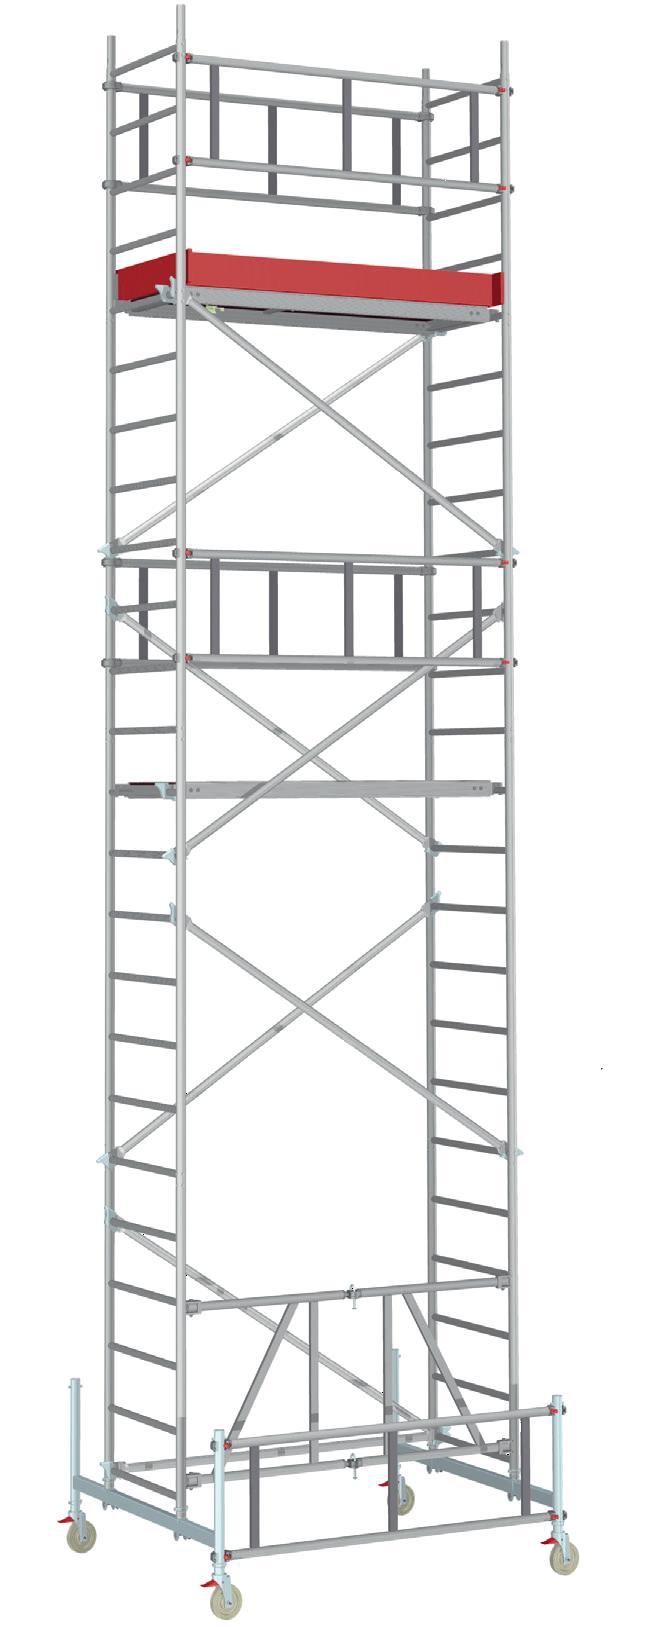 echafaudage tour escalier boss ees echafaudage italy. Black Bedroom Furniture Sets. Home Design Ideas